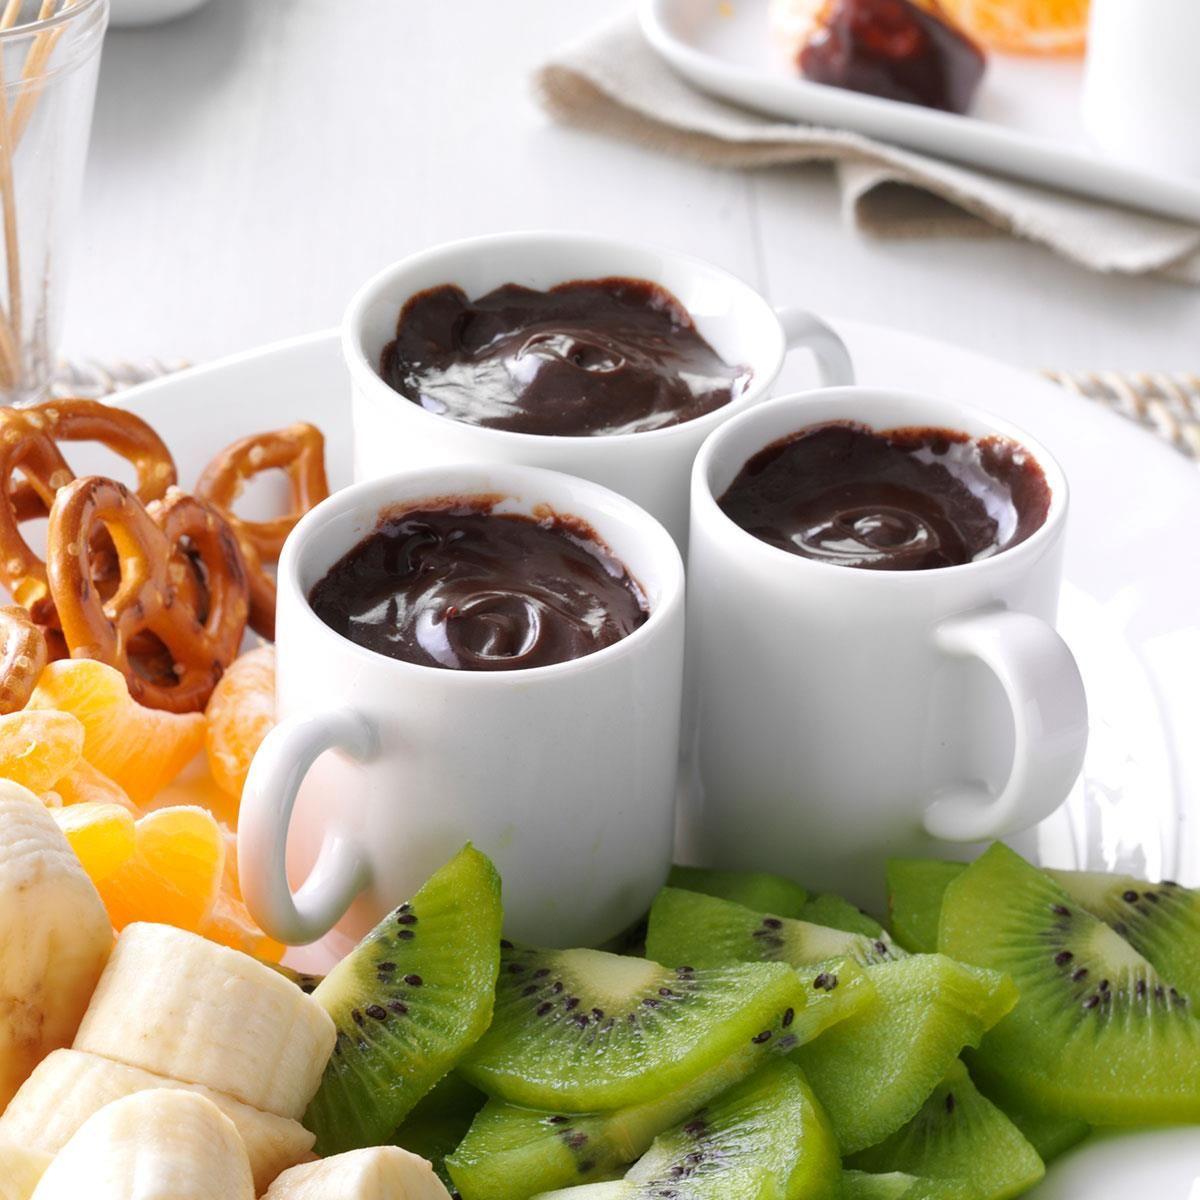 Chocolate Caramel Fondue Recipe Sweetened Condensed Milk Recipes Milk Recipes Condensed Milk Recipes